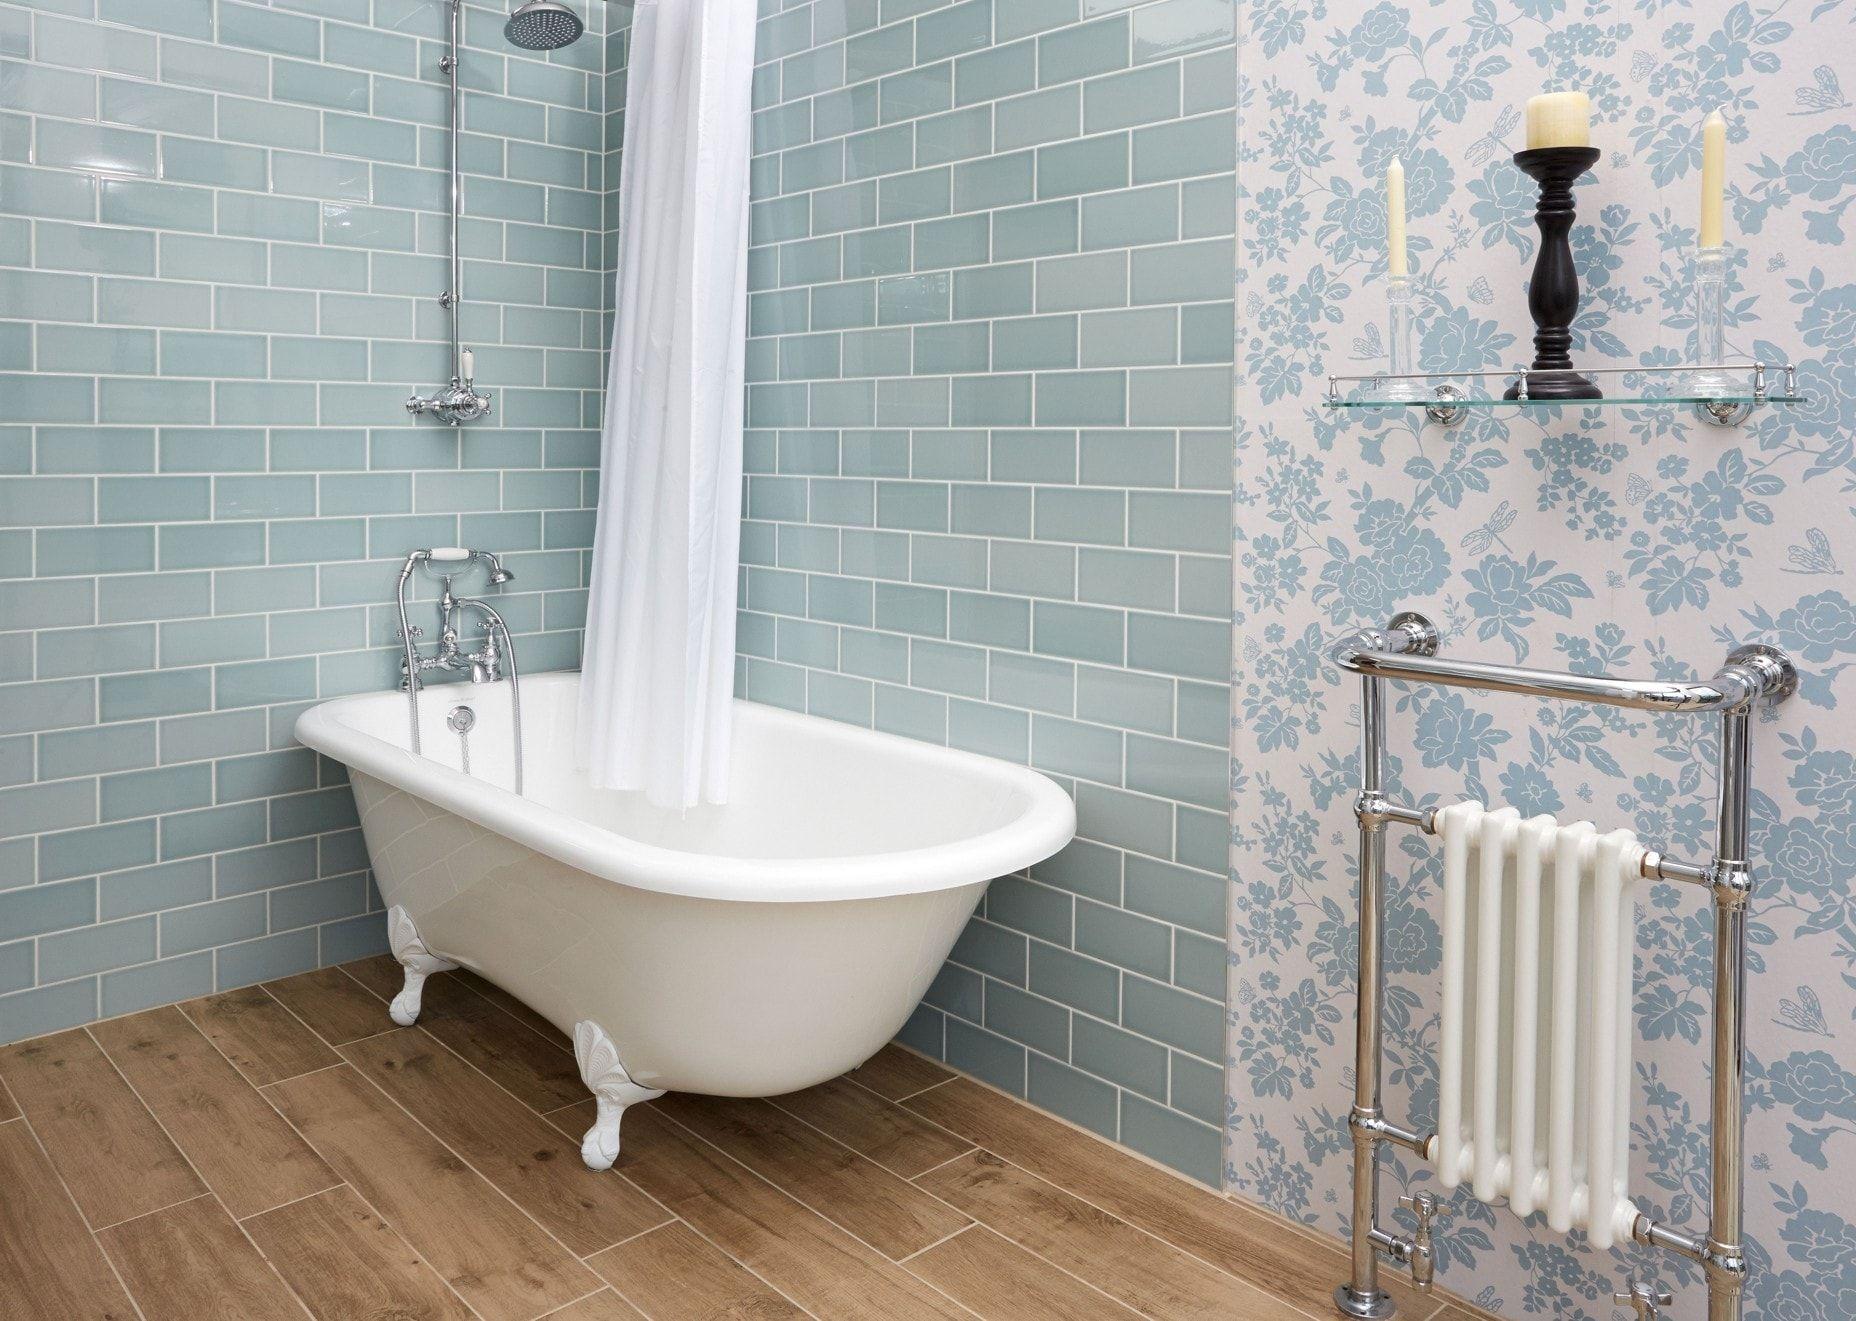 Bathroom Tile Alternative Walls | Bathroom Exclusiv | Pinterest ...